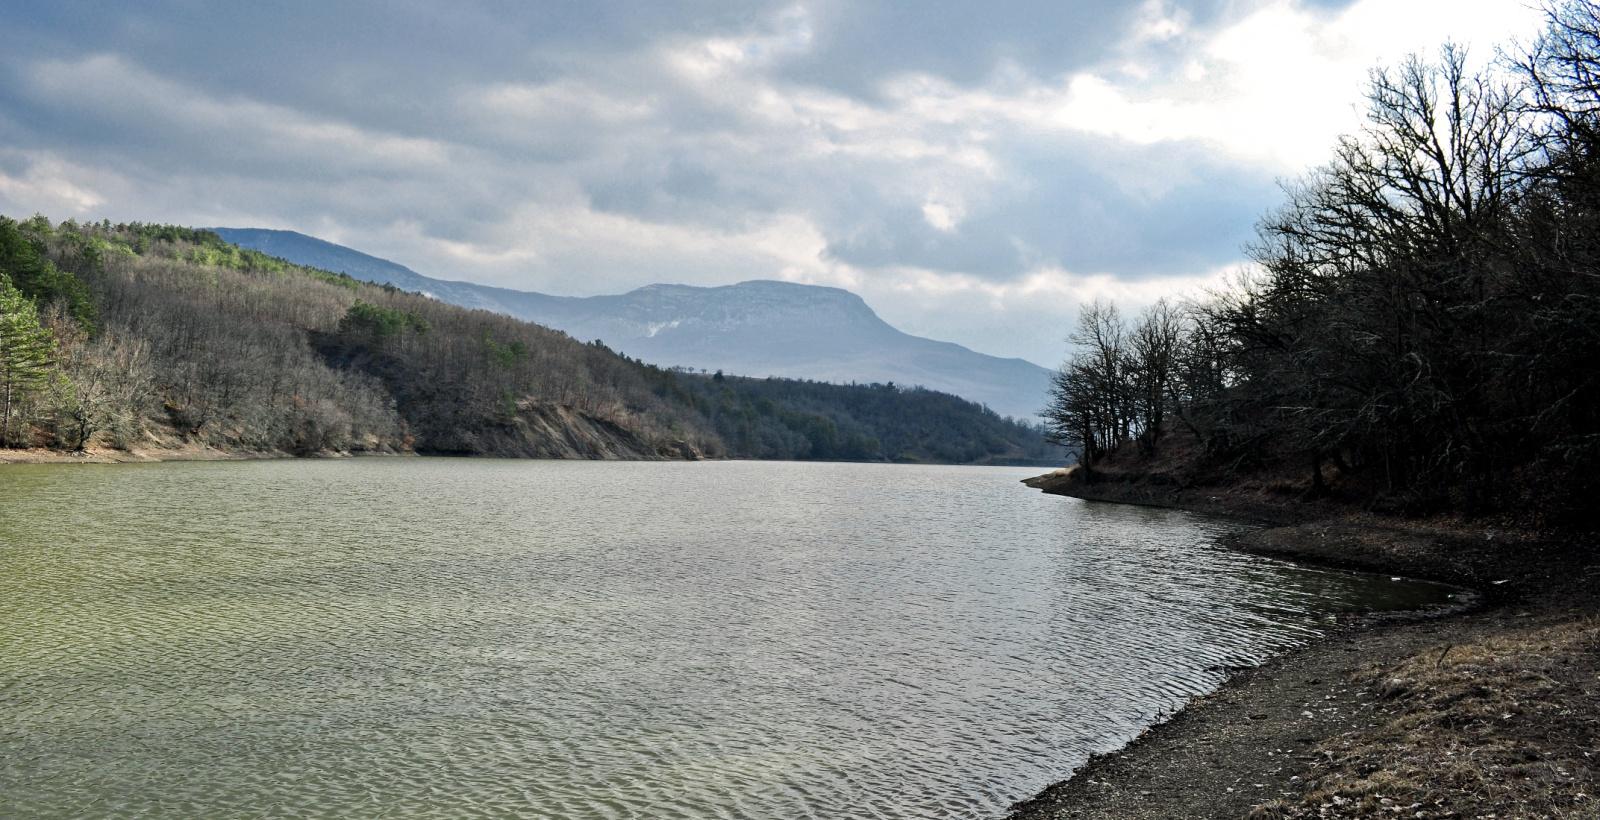 Описание: 24-26 марта 2012 (Большой каньон)\_DSC0067-Edit.jpg